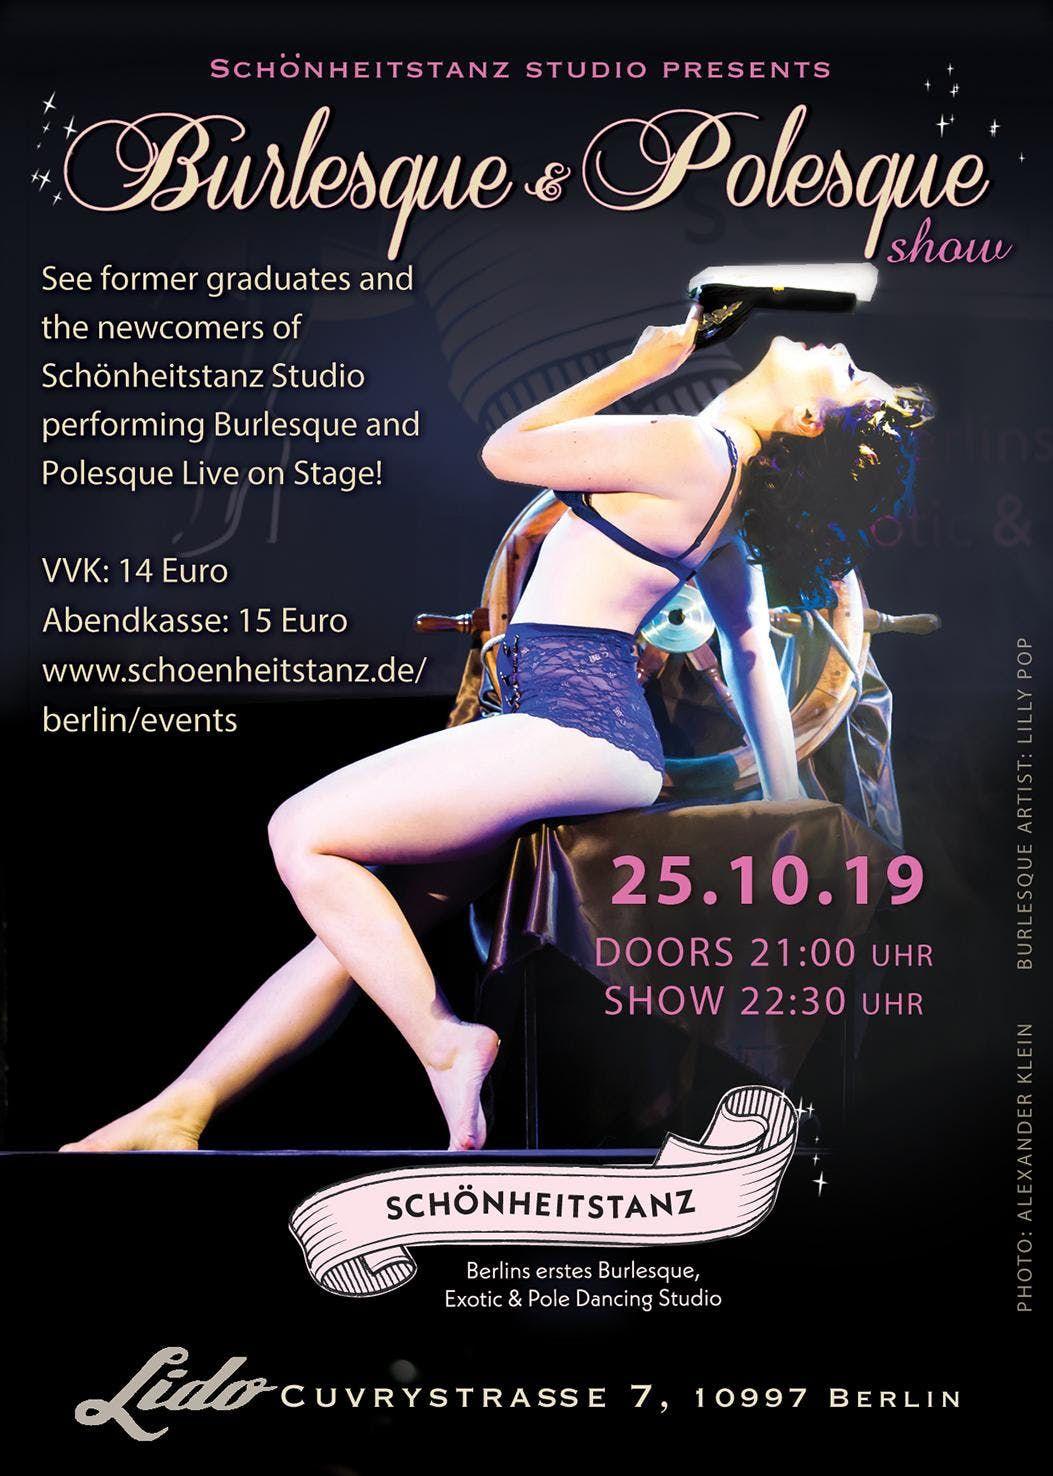 Schnheitstanz presents A Night of live Burlesque & Polesque No 14